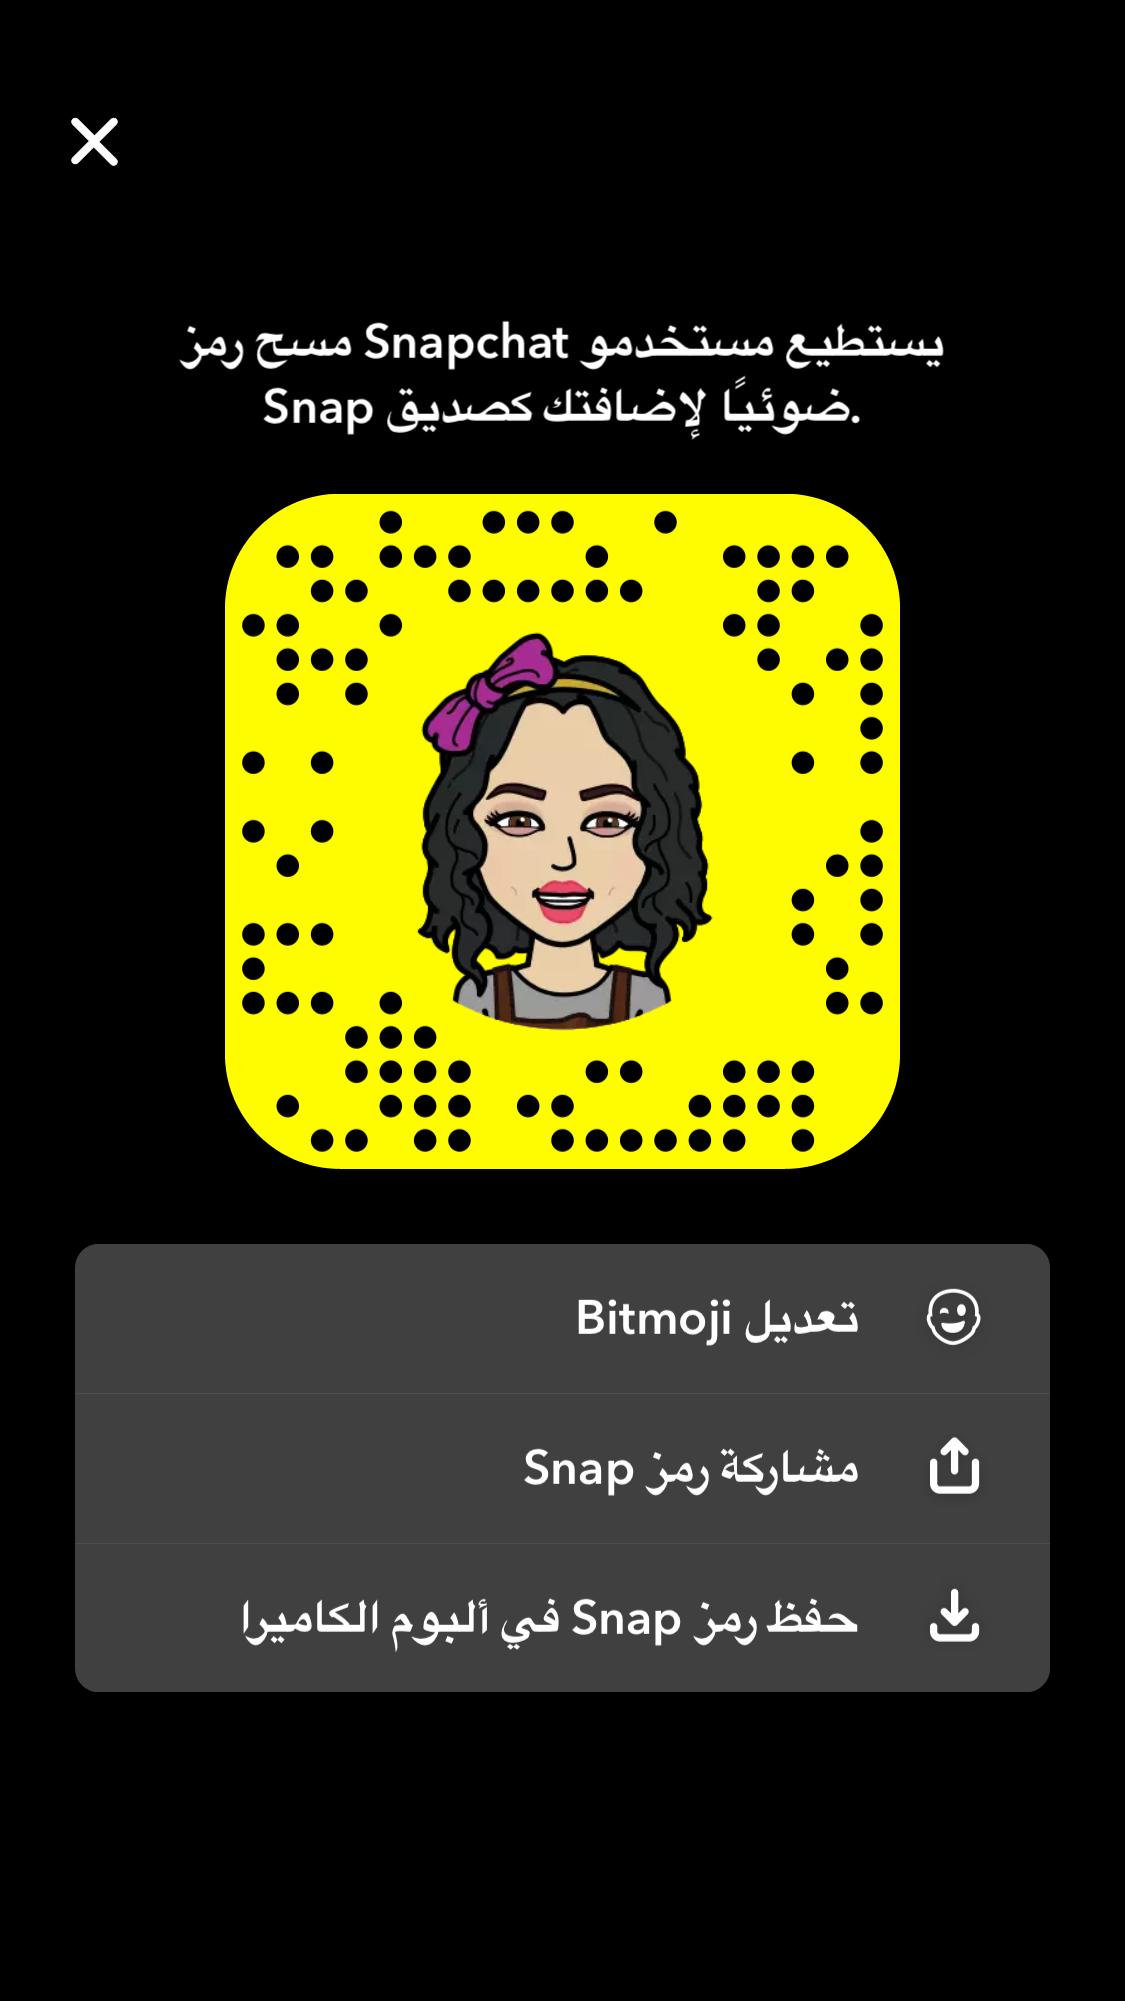 سناب شات Snapchat Screenshot Snapchat Screenshots